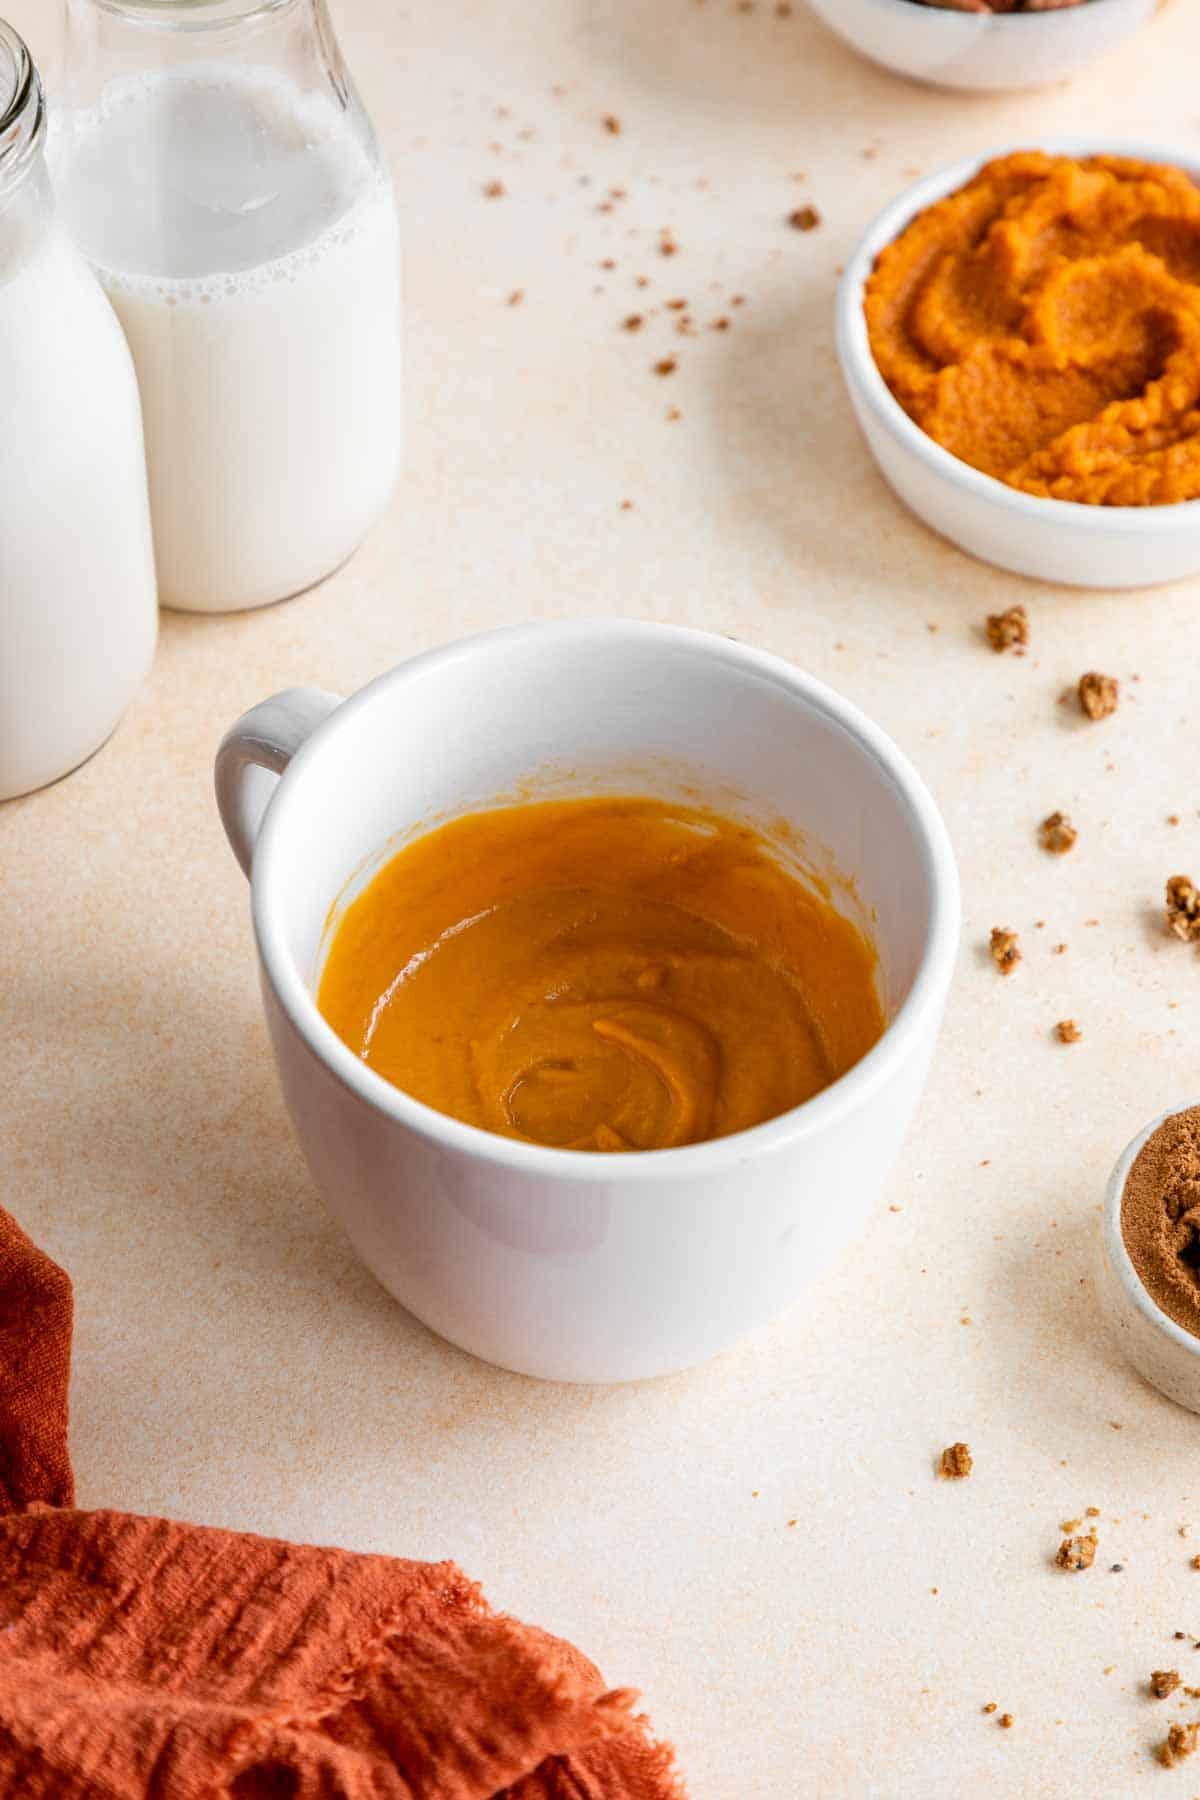 vegan pumpkin cake batter inside a mug